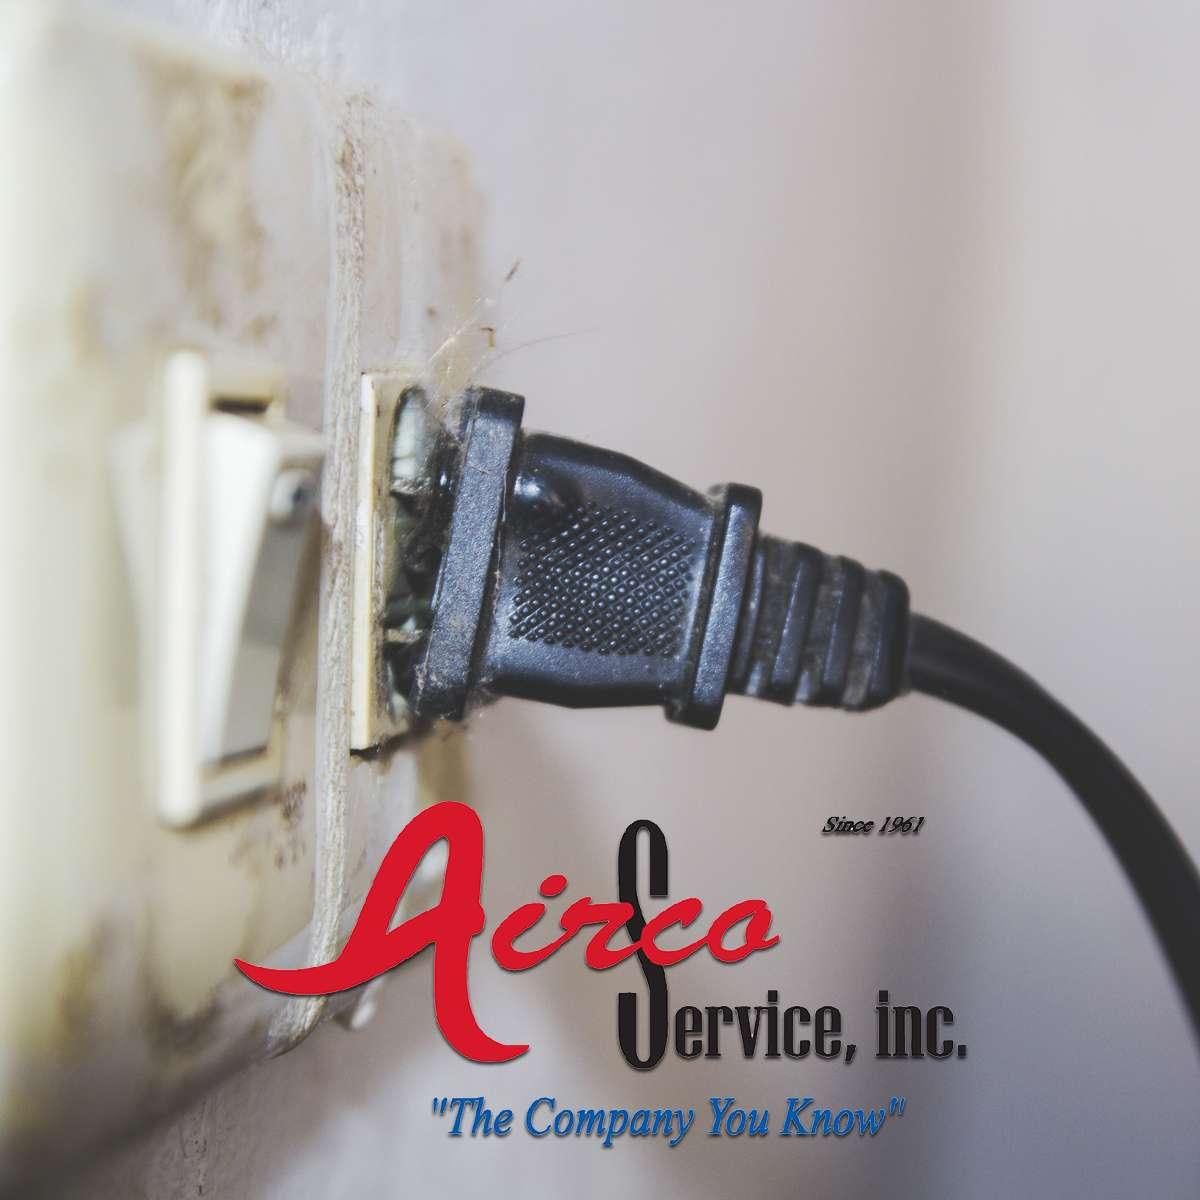 Why Choose Airco Service